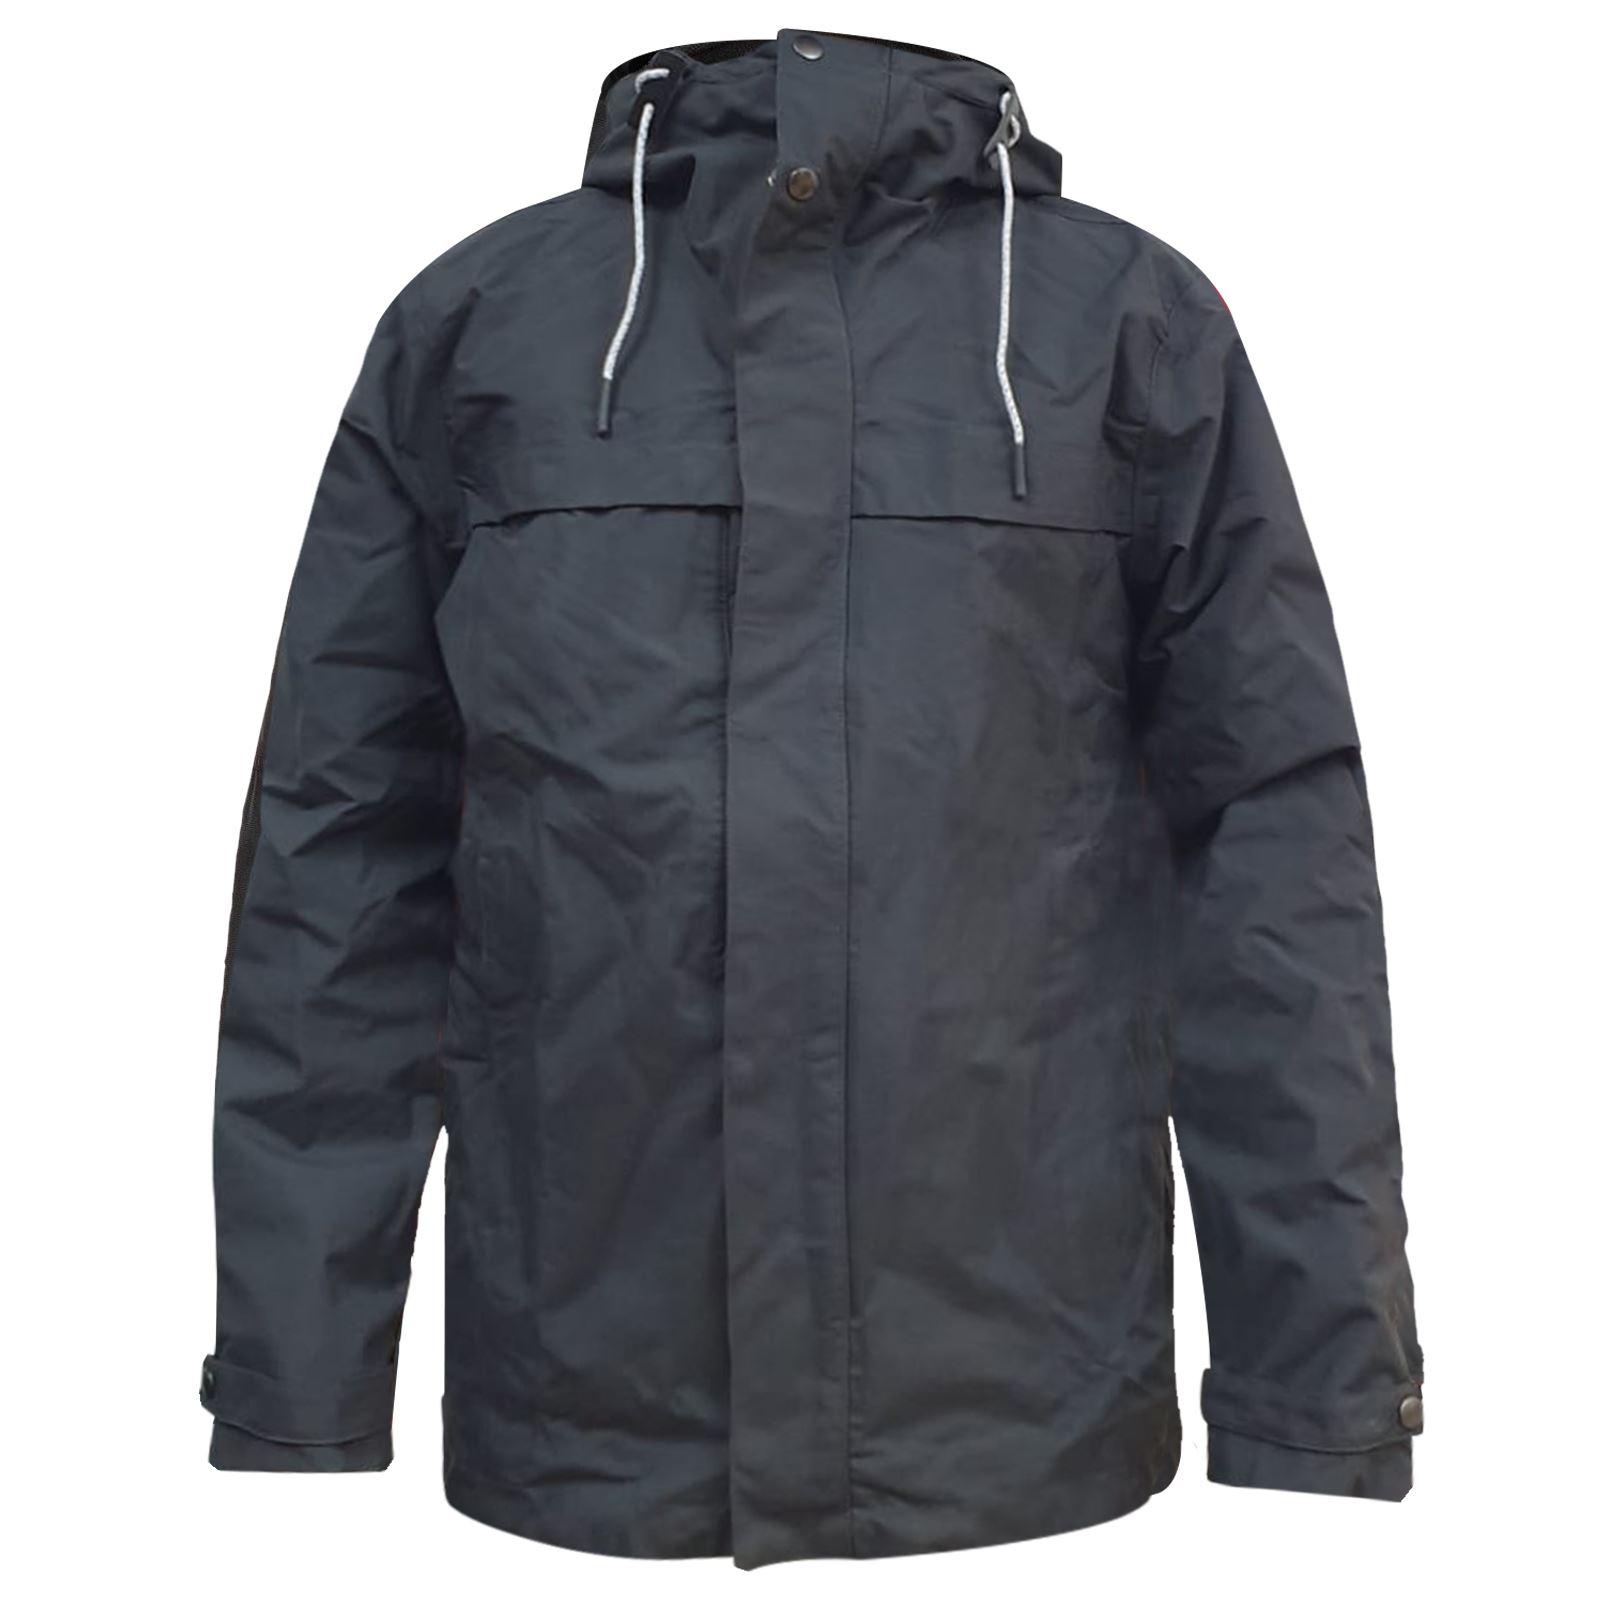 Result-Homme-Randonnee-Impermeable-Isole-Rembourre-Matelasse-Capuche-Trek-Coat miniature 5